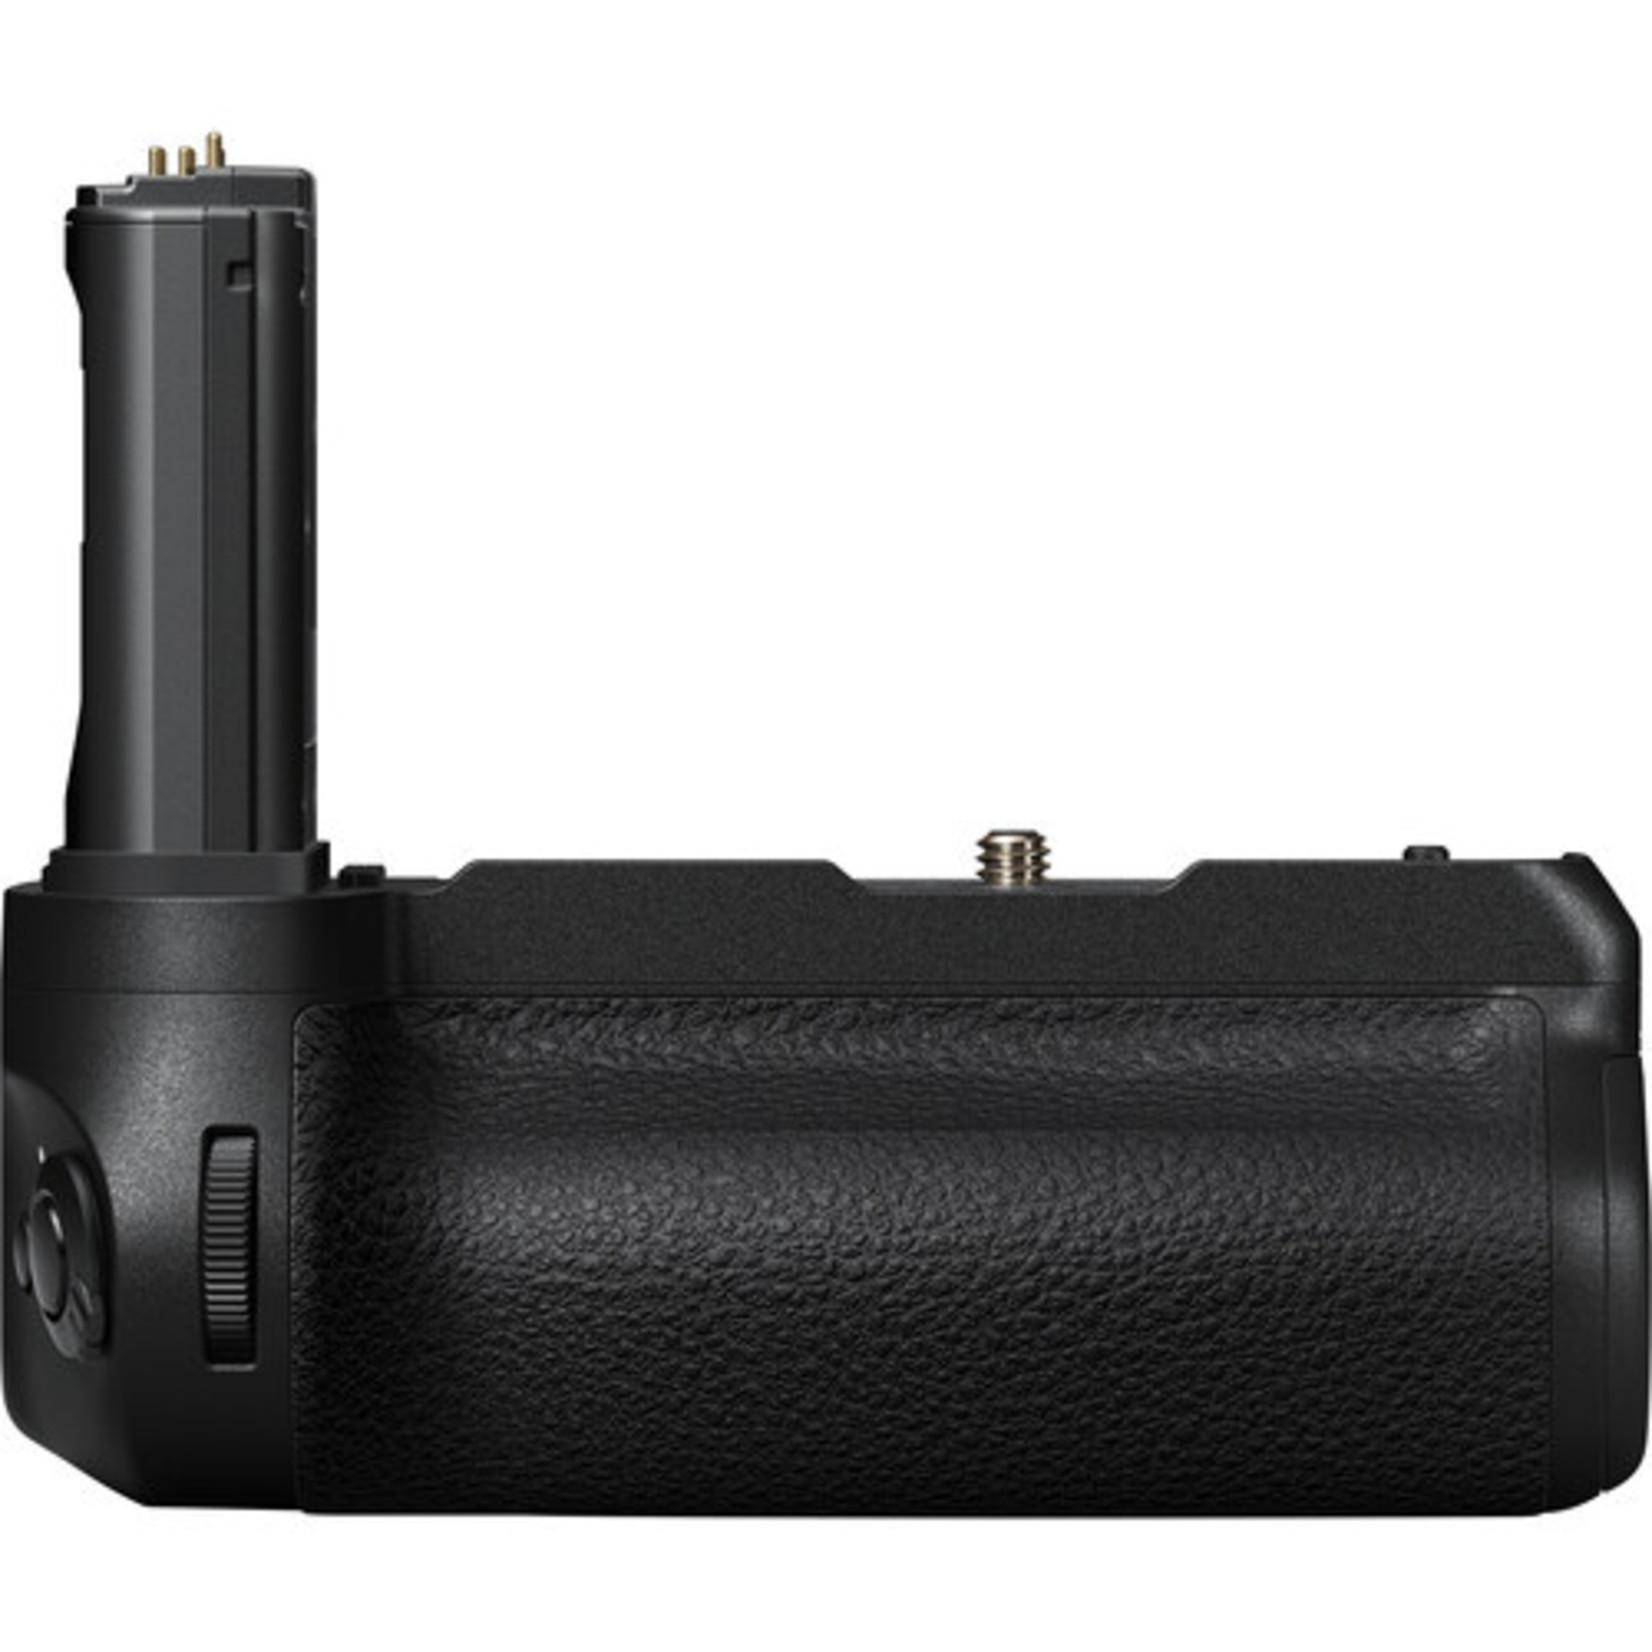 Nikon Nikon MB-N11 Power Battery Pack with Vertical Grip